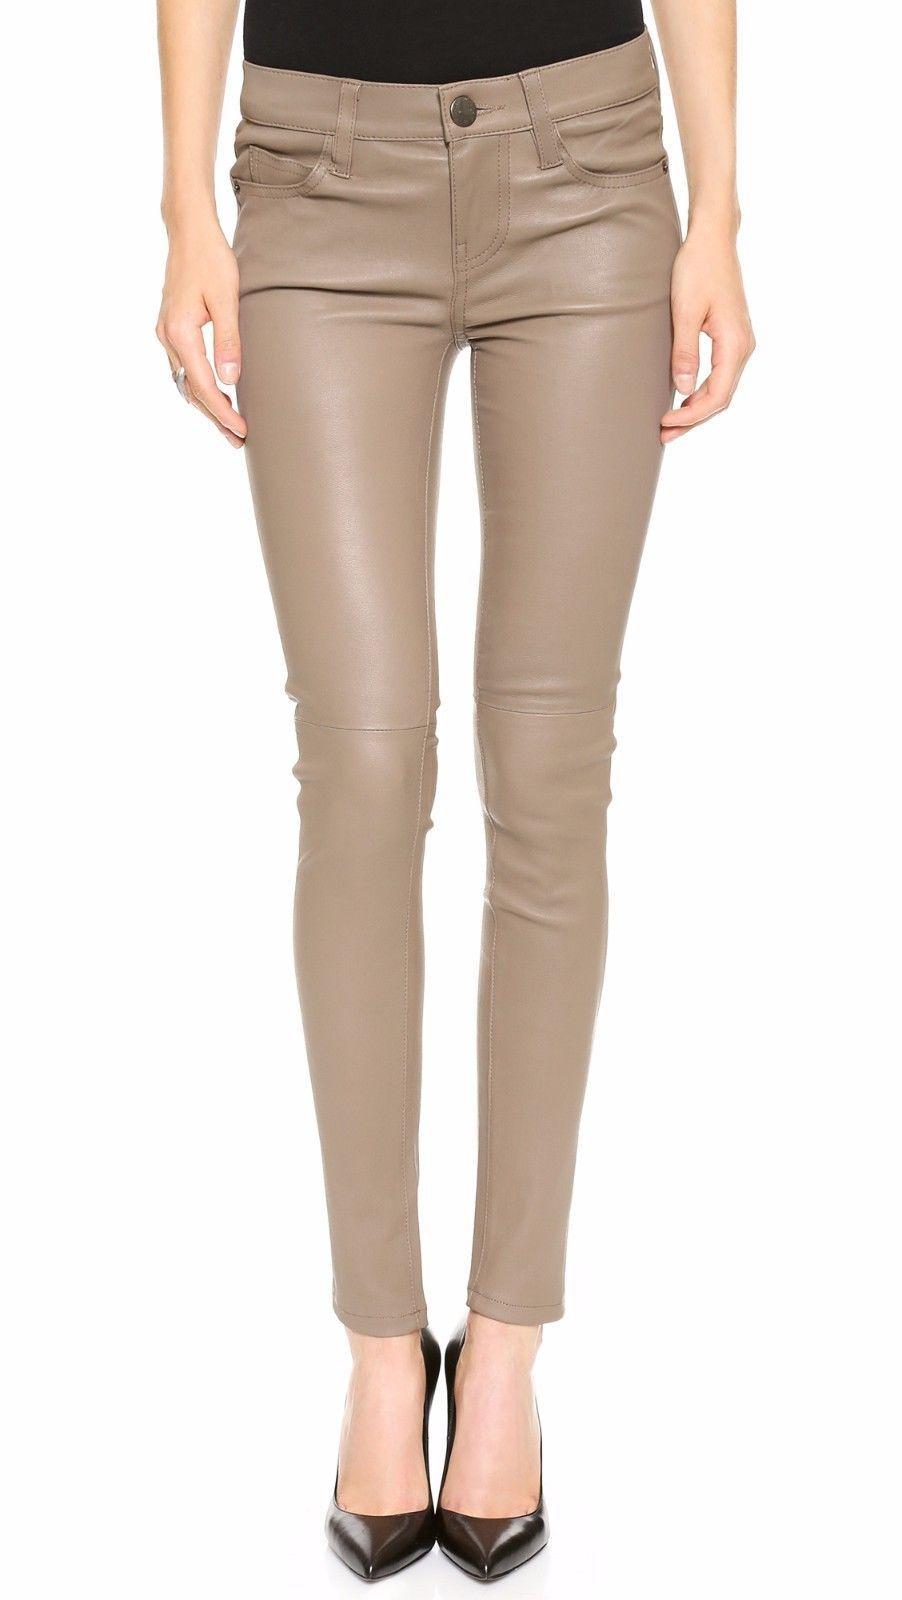 HotLeatherWorld Women Sexy Trendy Women Leather Pant Leather Capri Trouser P-1